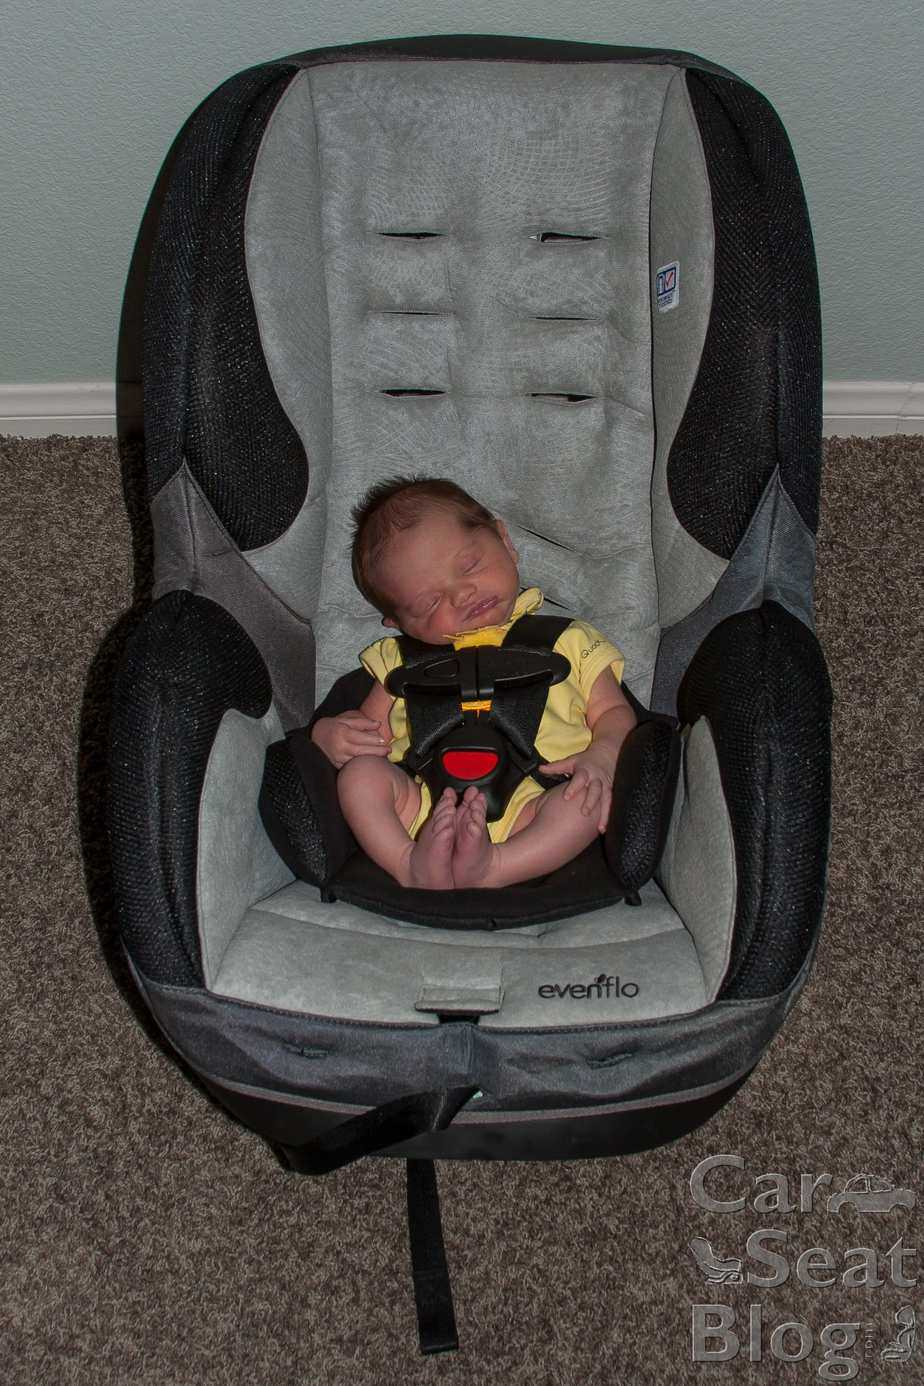 Photo Credit Car Seat Blog